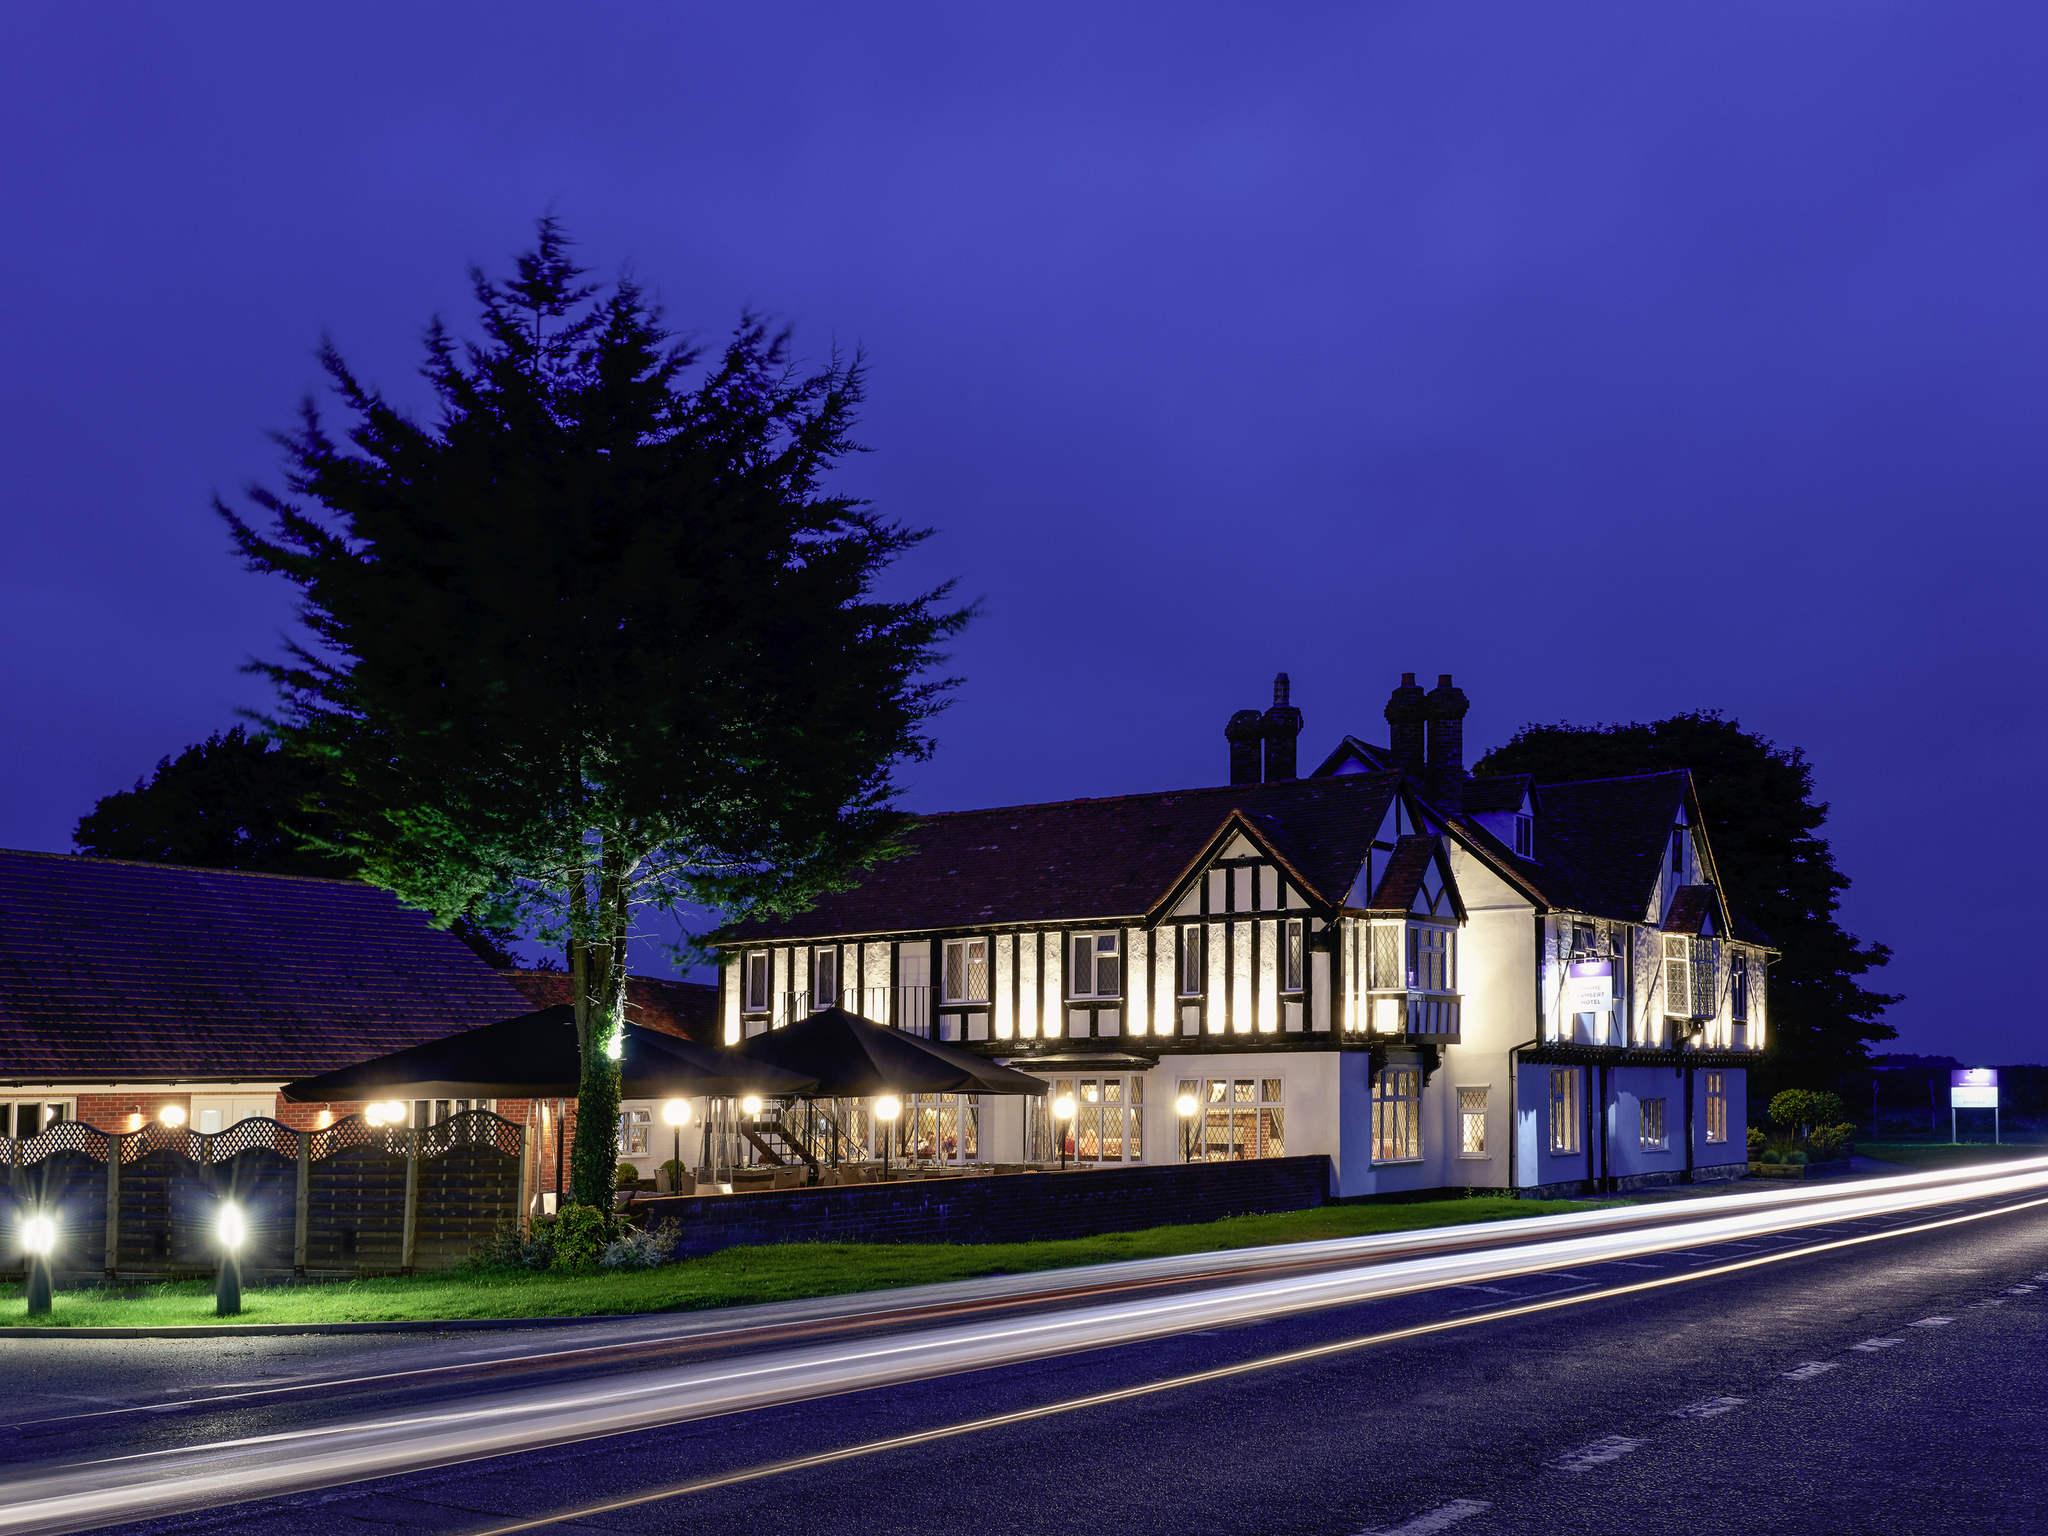 Hotel - Hotel Mercure Thame Lambert